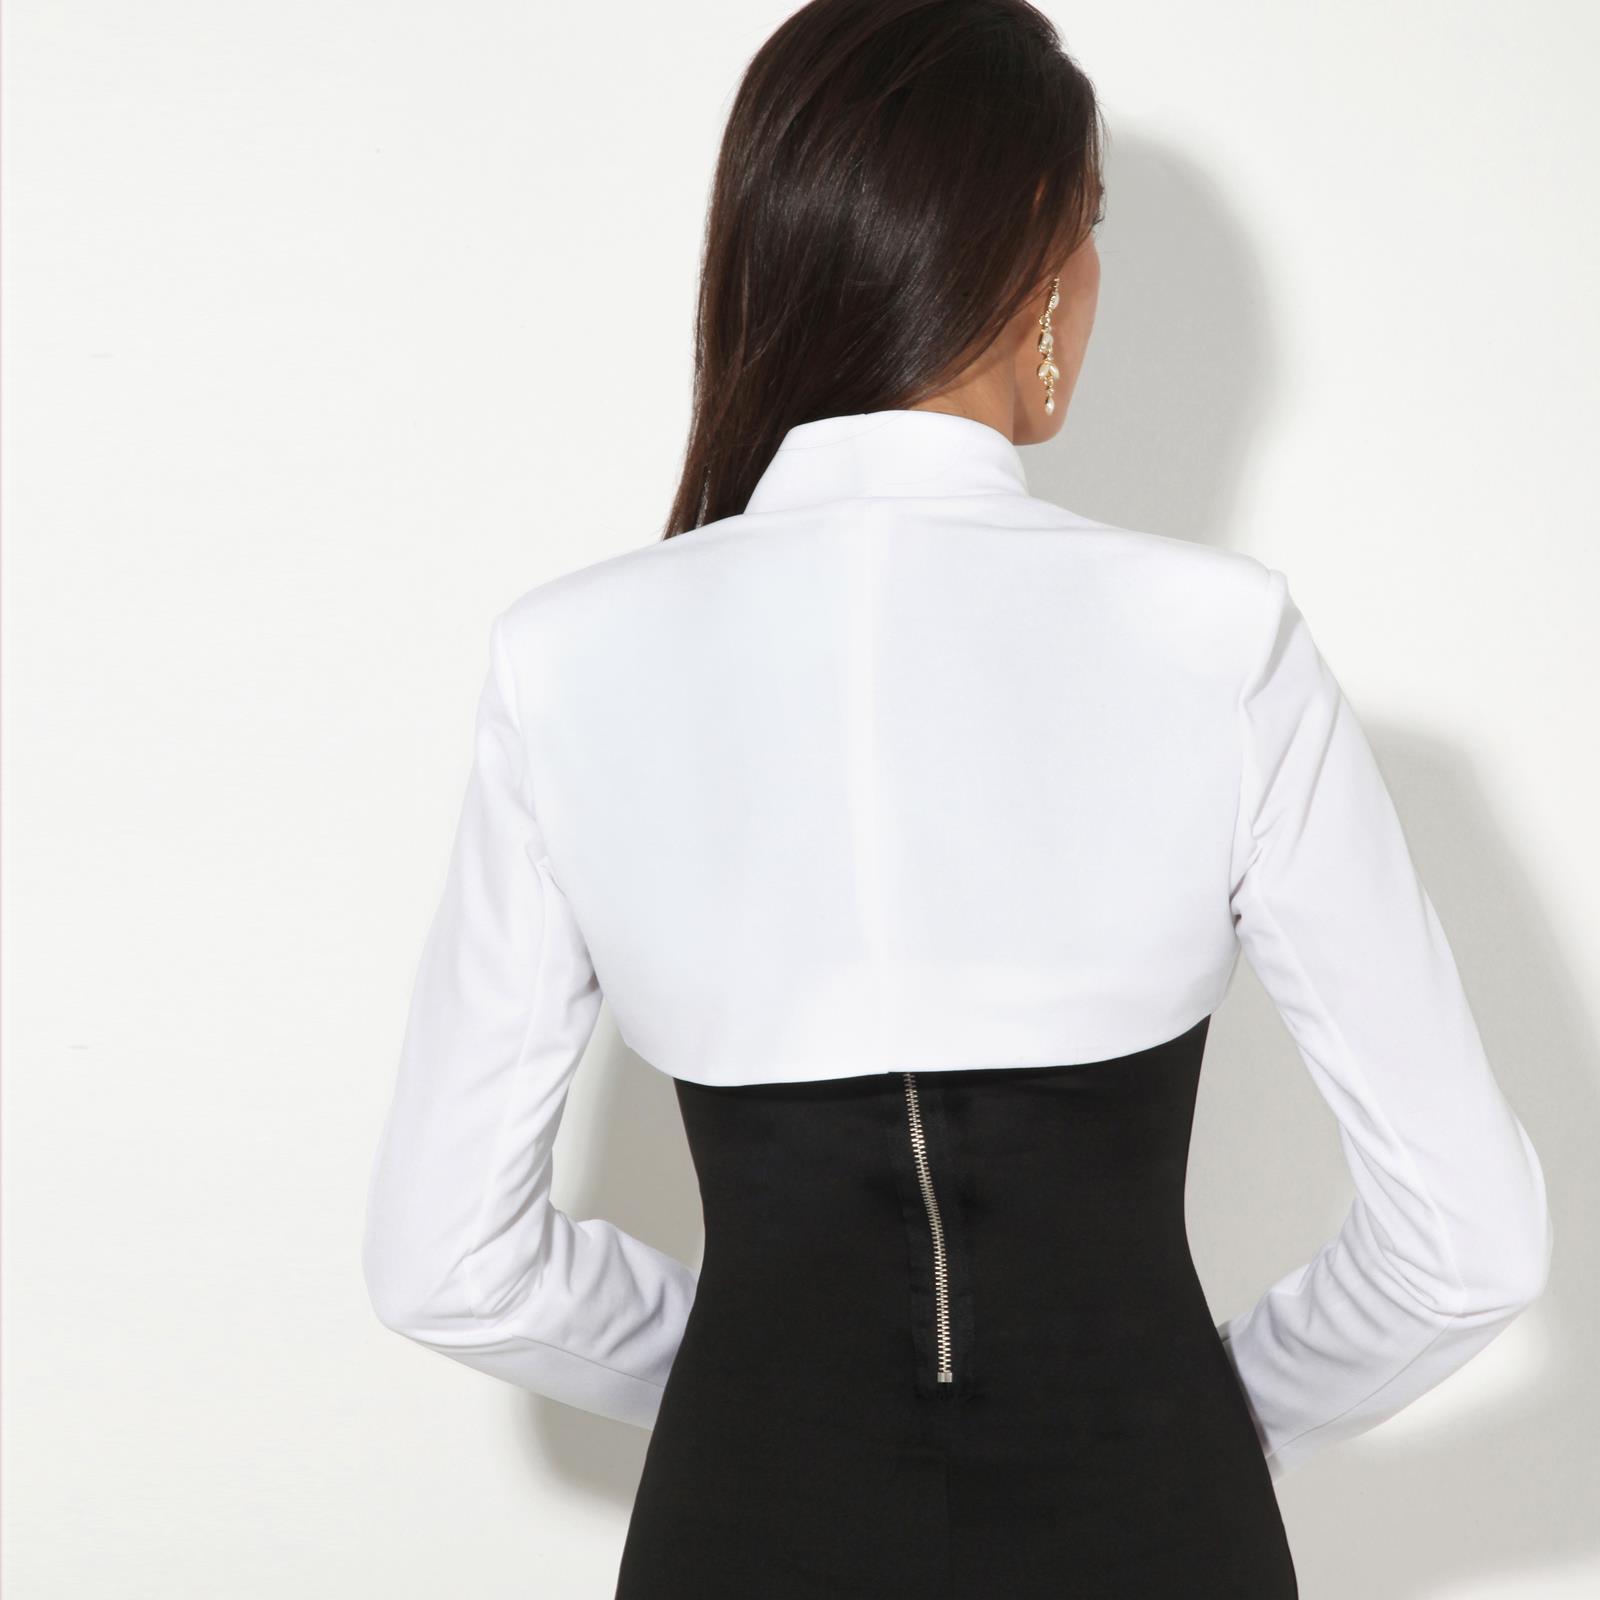 Womens-Ladies-Bolero-Jacket-Shrug-Chiffon-Long-Sleeve-Crop-Top-Blazer-Coat-Party thumbnail 13